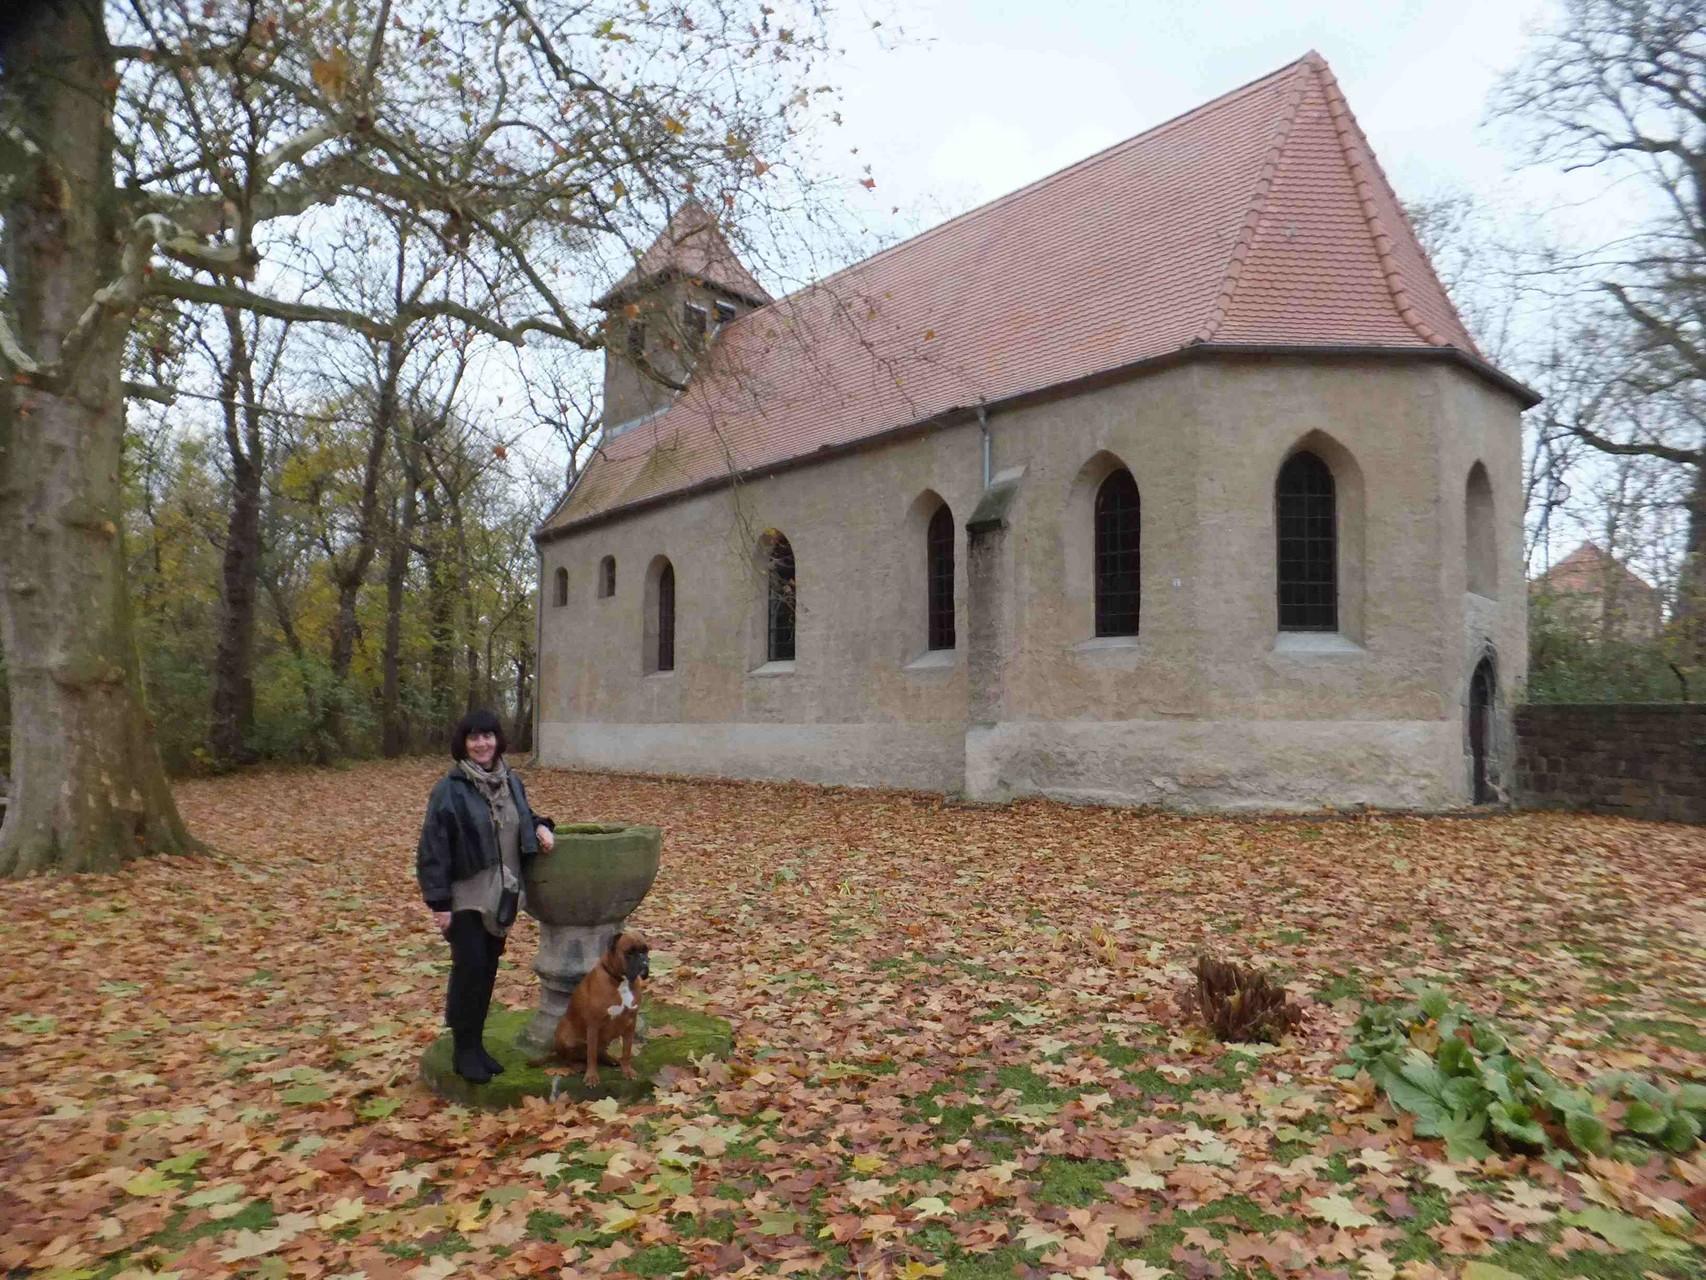 Falkenhain Kirche mit Taufbecken